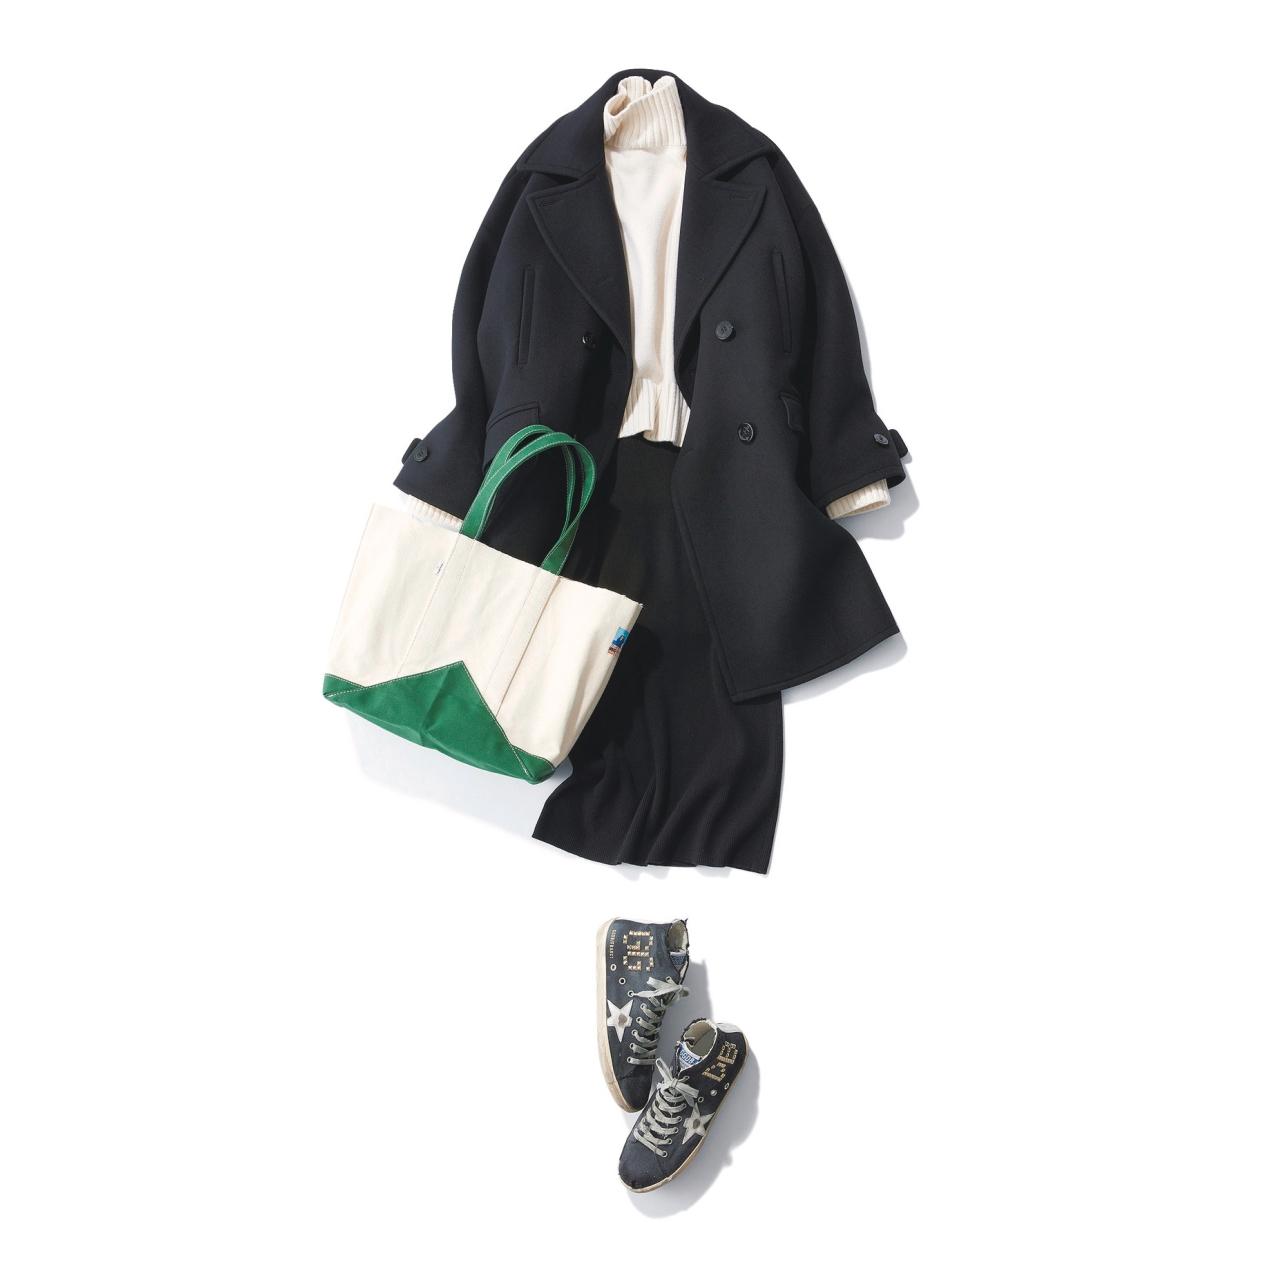 Pコート×スニーカーのファッションコーデ